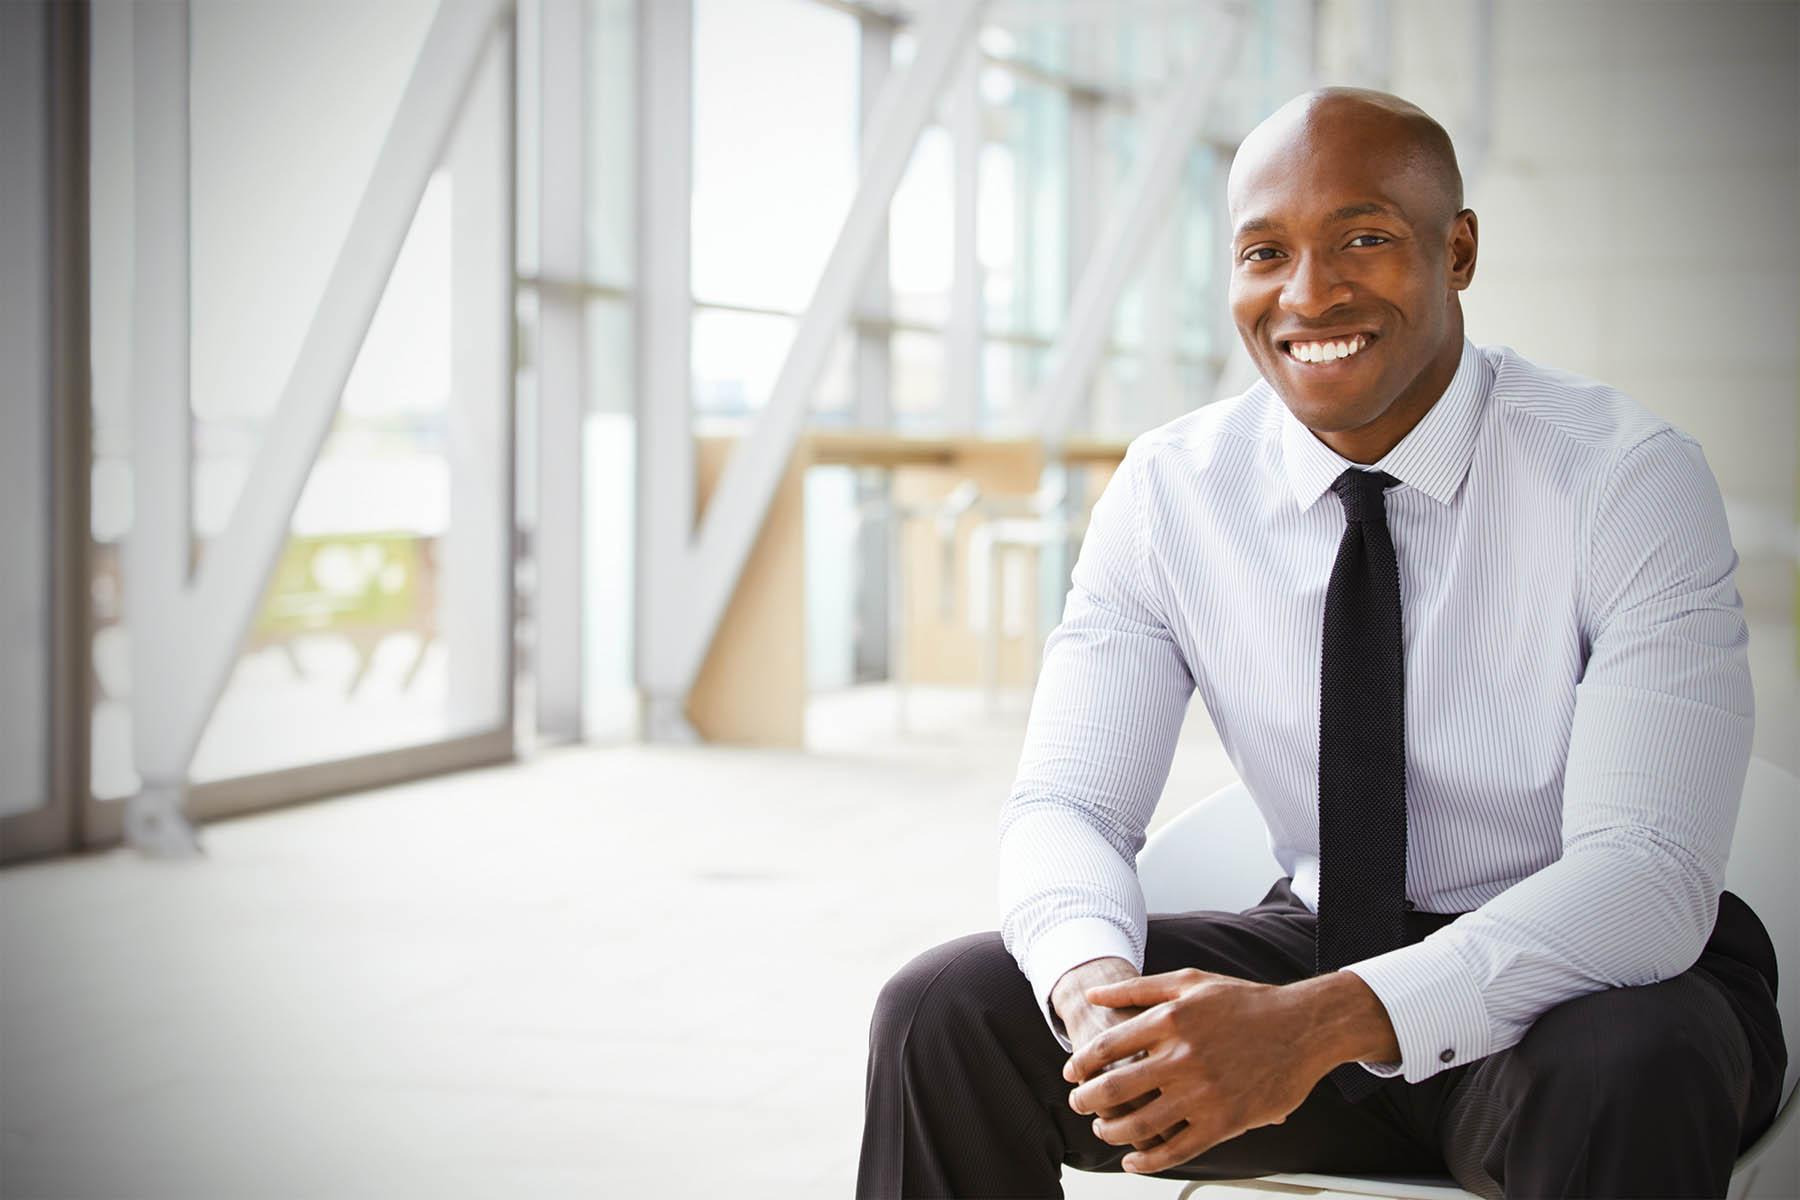 Businessman in office in suit